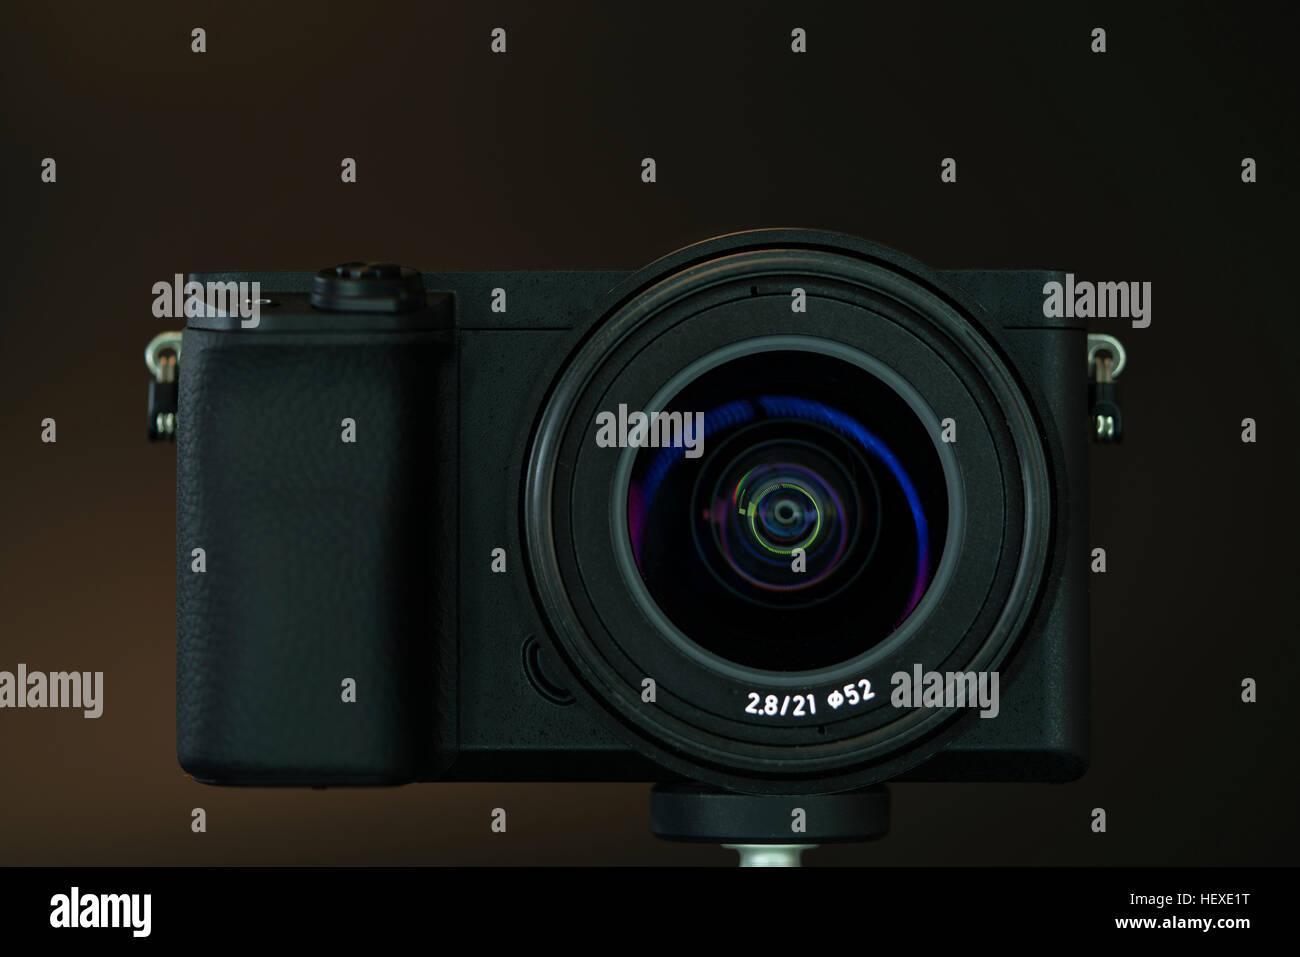 Digital camera. - Stock Image